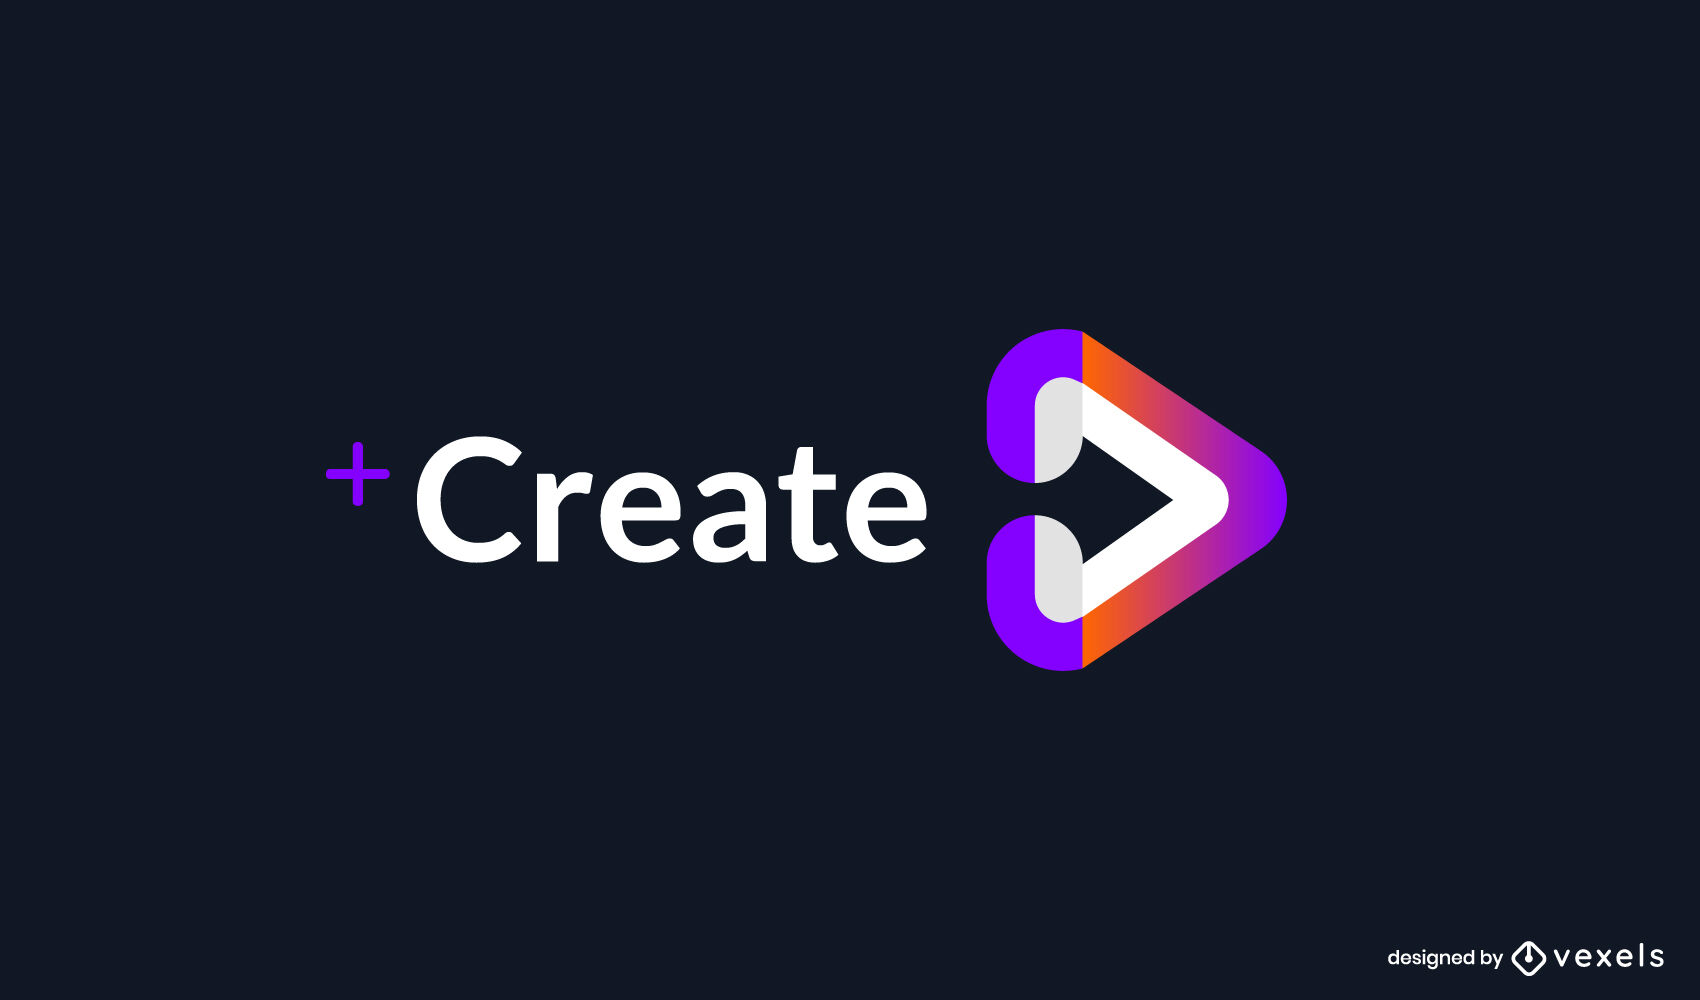 Streaming play símbolo logo degradado